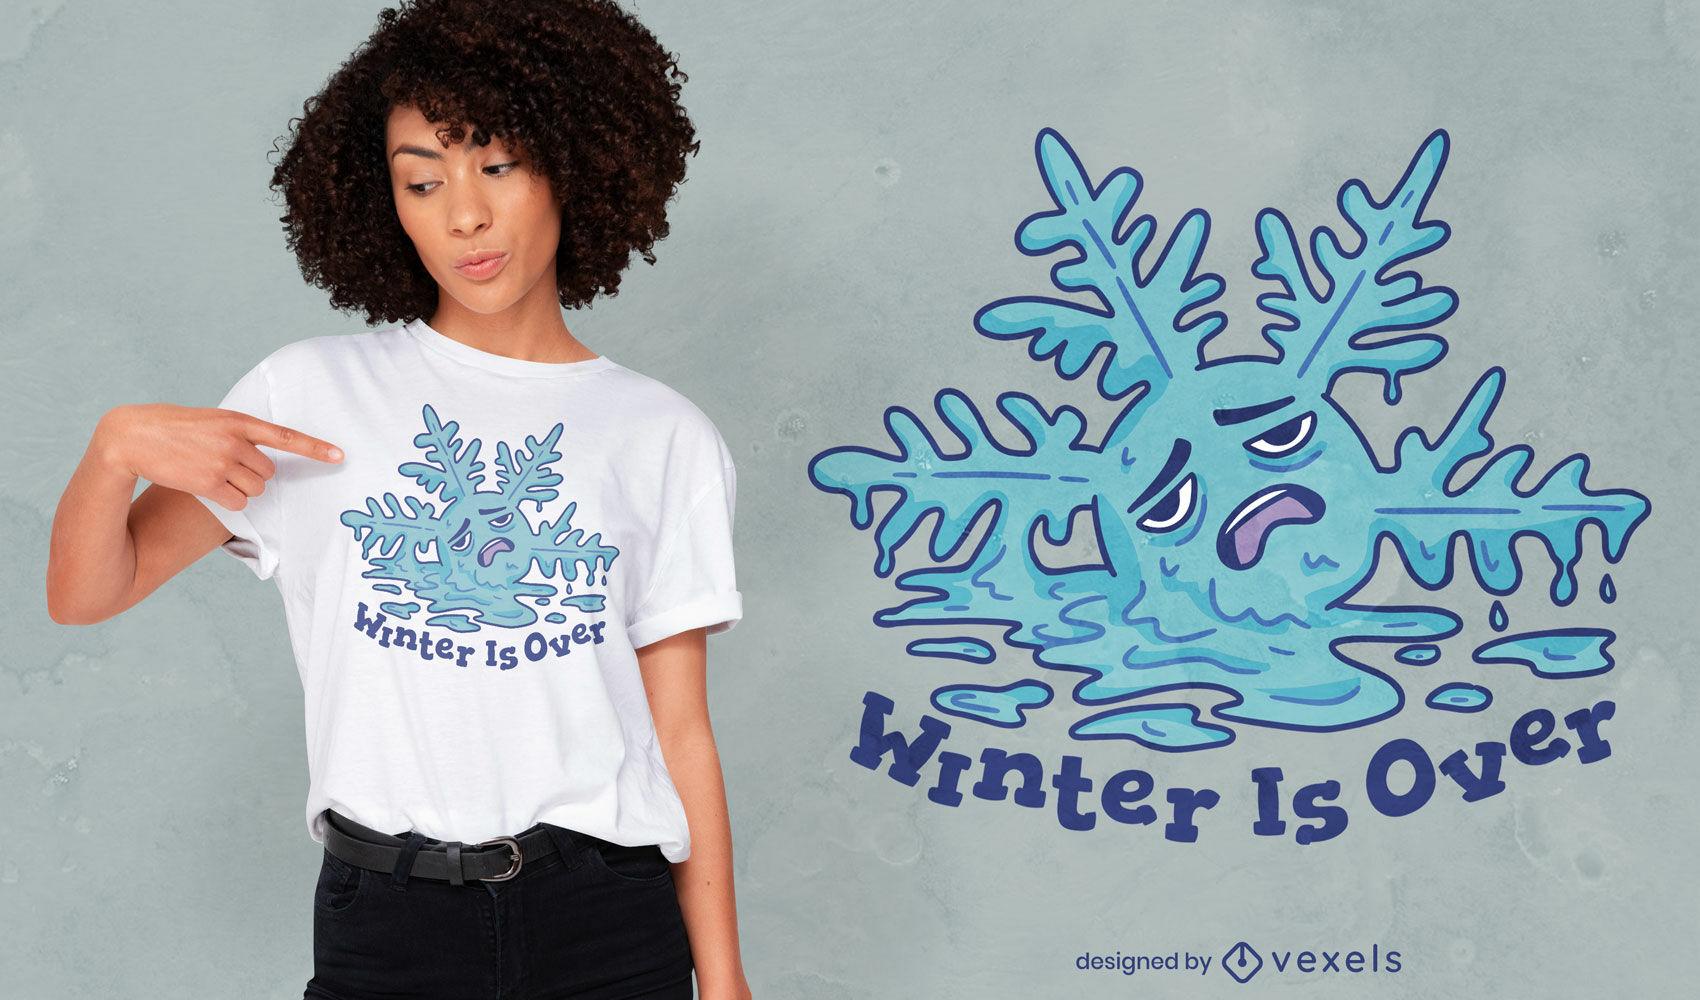 Melting snowflake winter t-shirt design